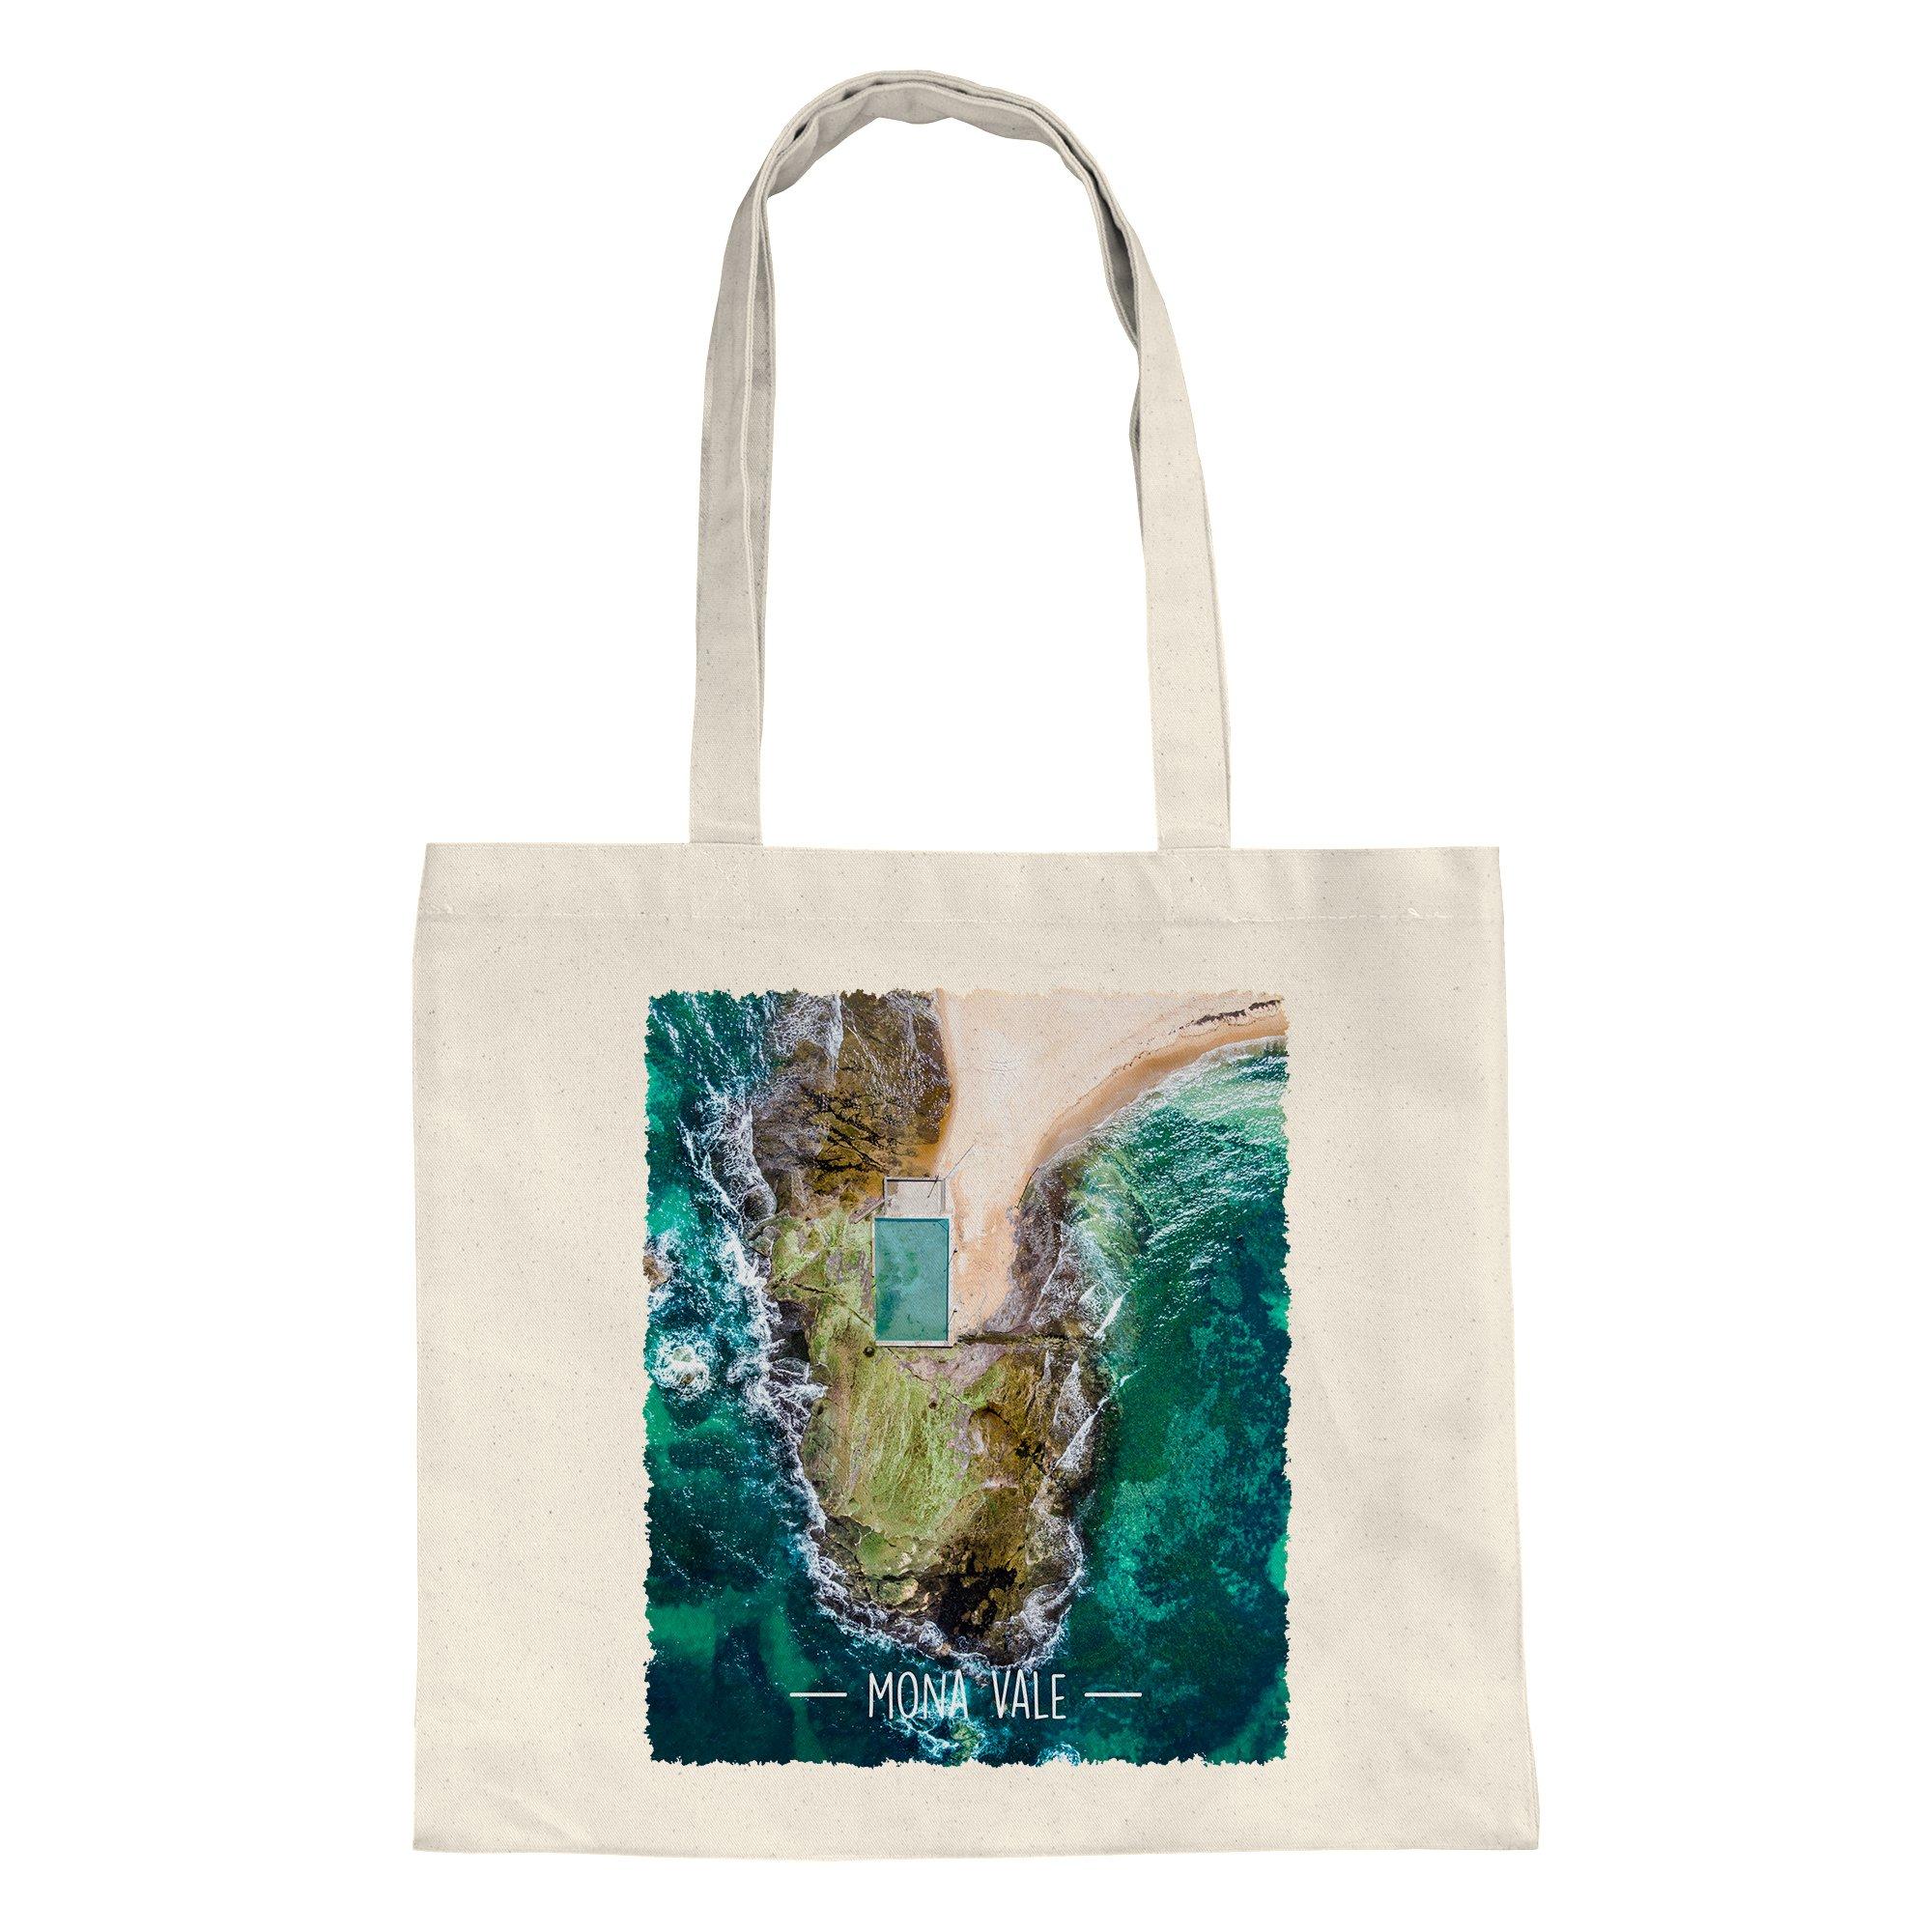 tote-shopping-bag-ocean-pool-mona-vale-beach